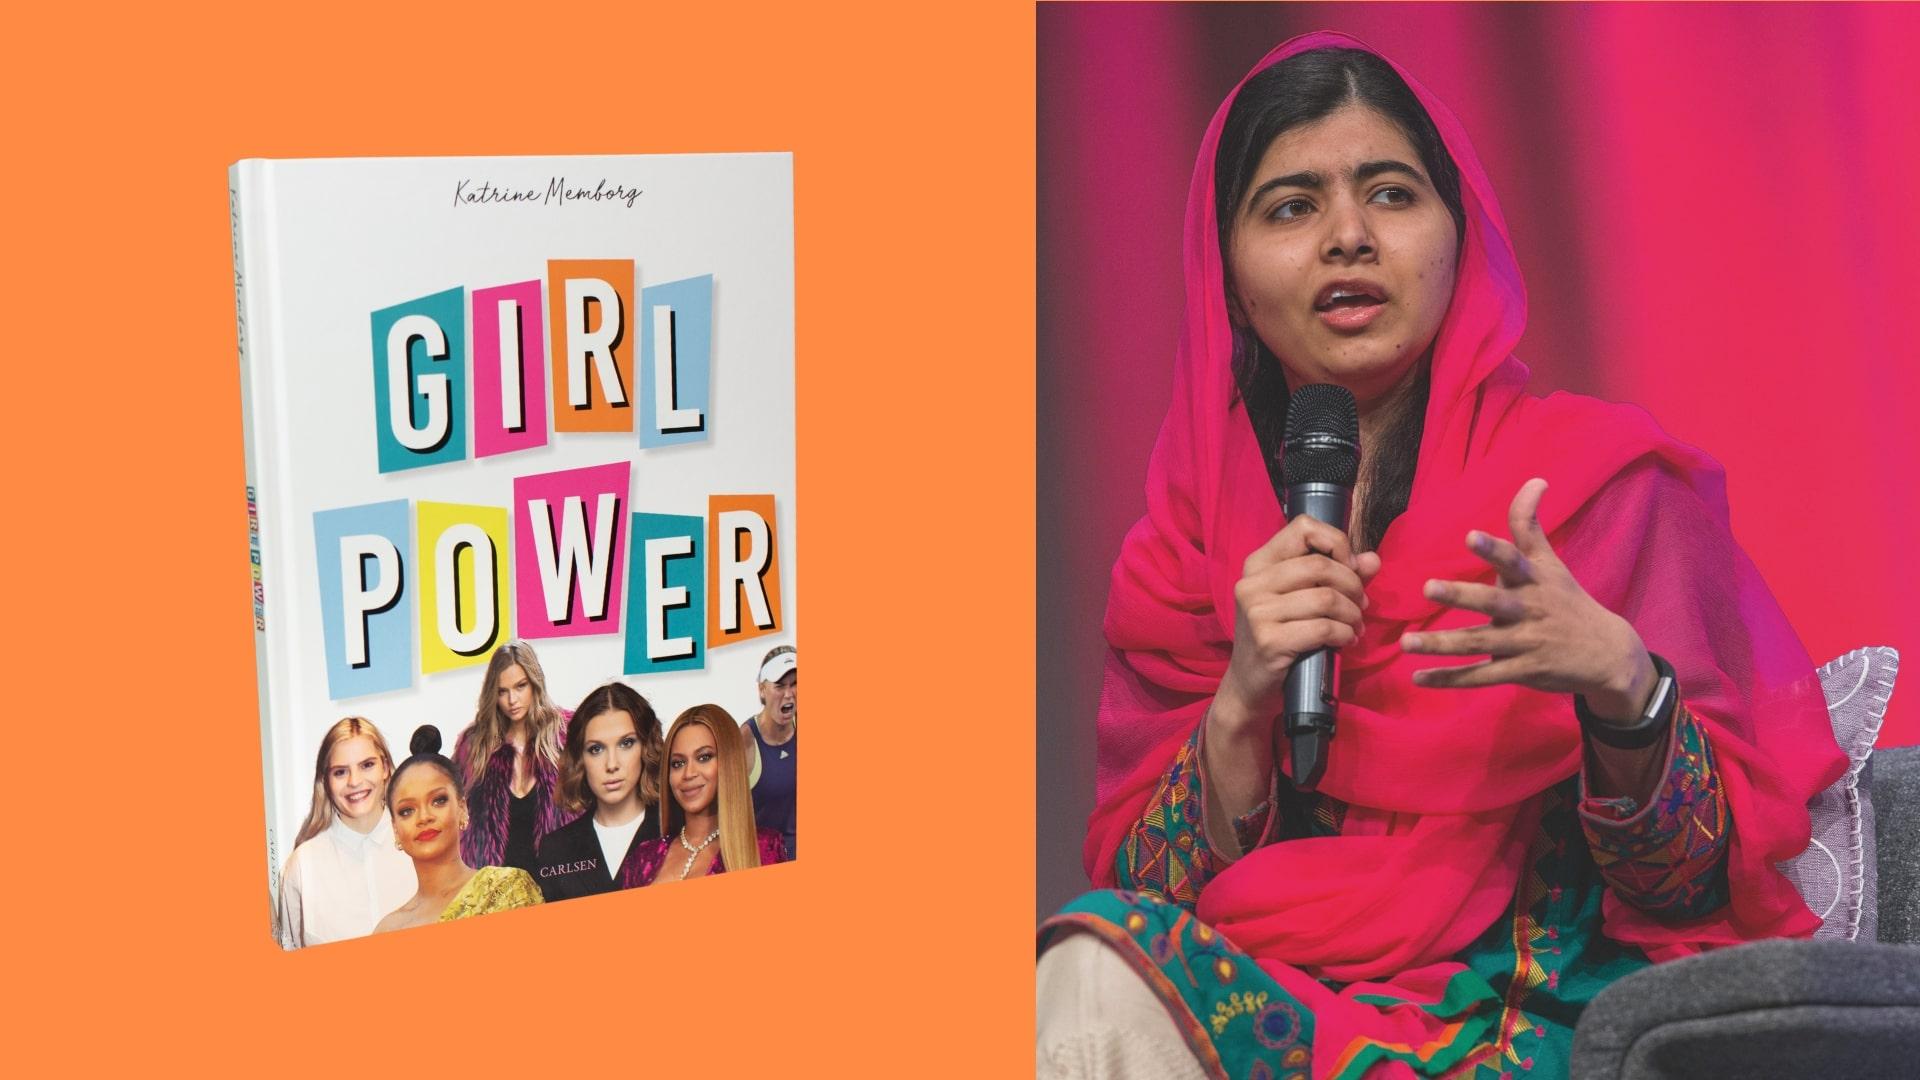 girl power, katrine memborg, børnebøger